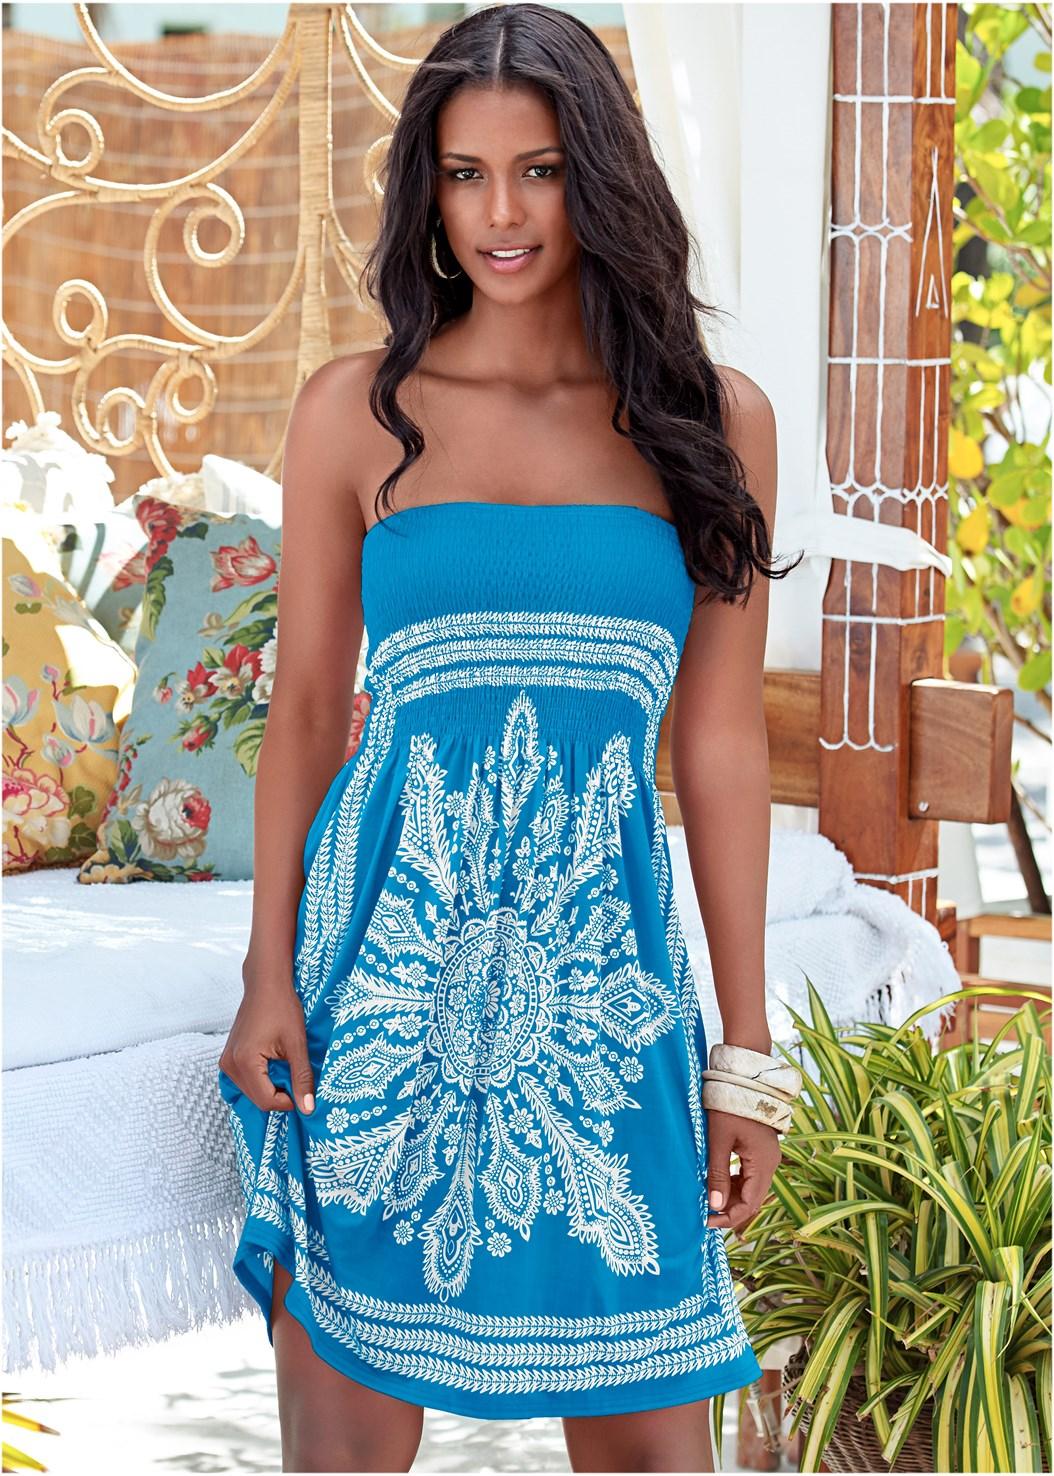 Bandeau Dress,By The Sea Bottom,Applique Bandeau One-Piece,Shell Detail Sandals